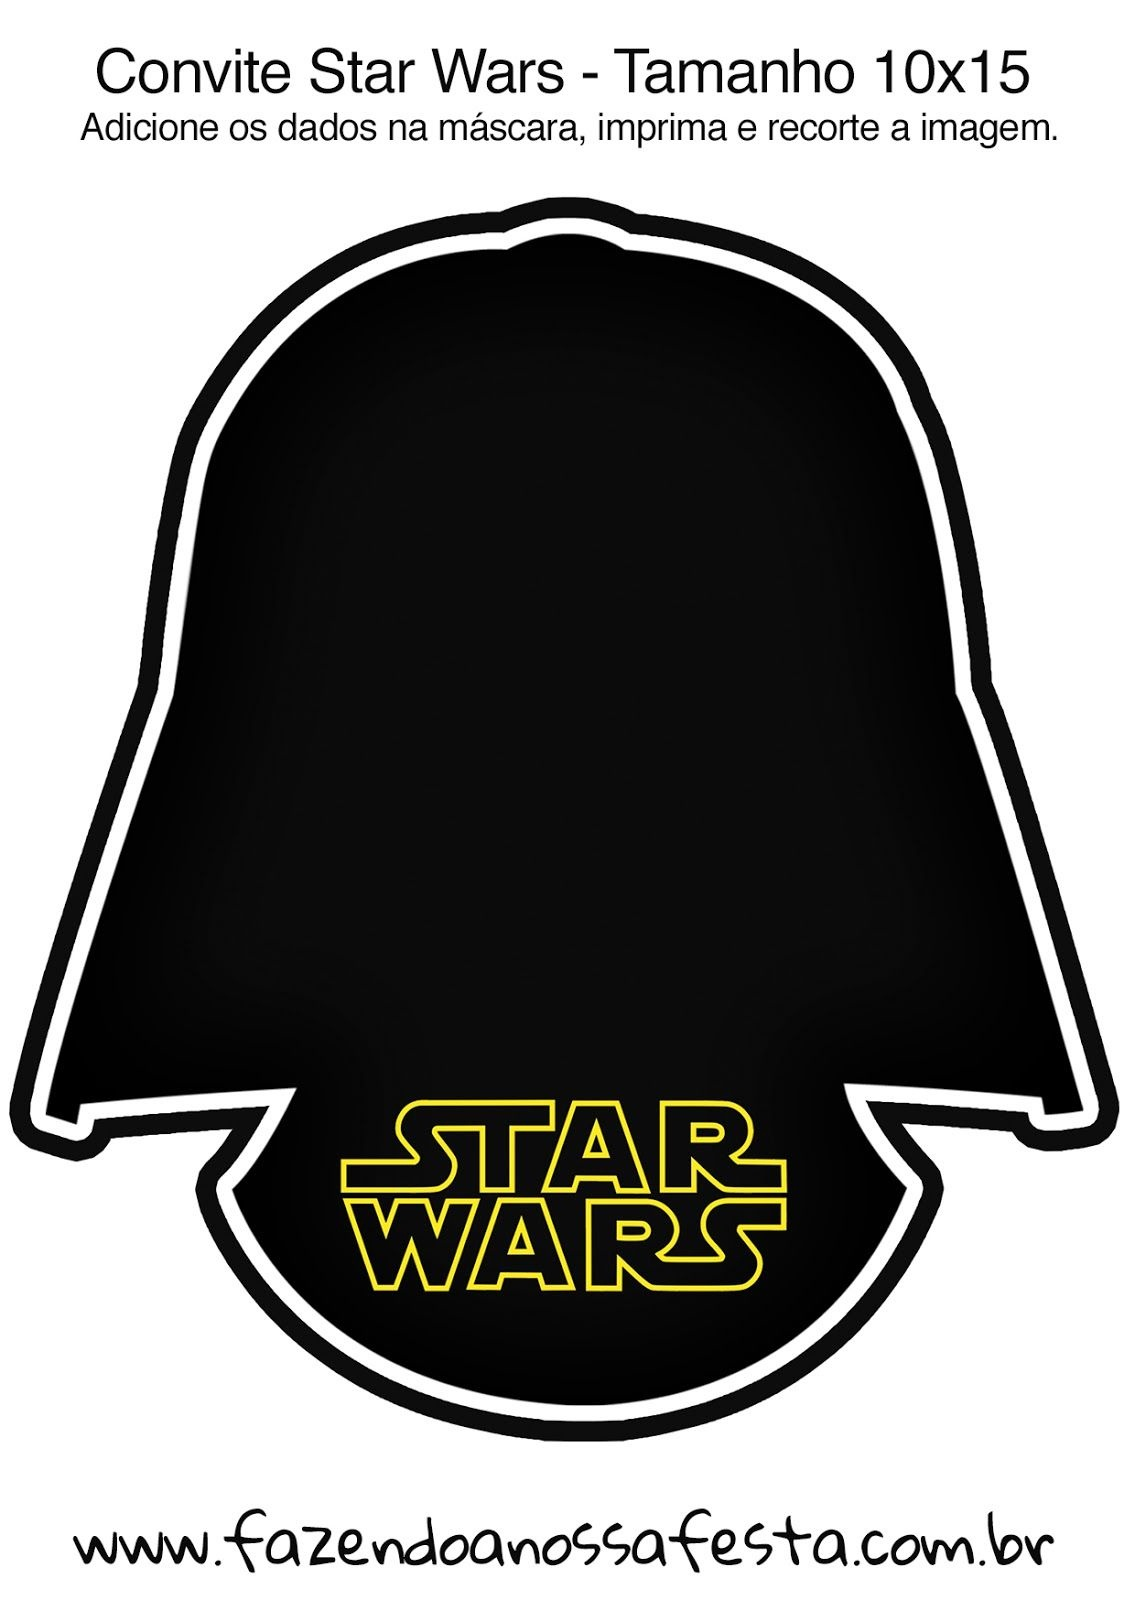 Star Wars: Free Printable Invitations.   Star Wars Party   Star Wars - Star Wars Invitations Free Printable